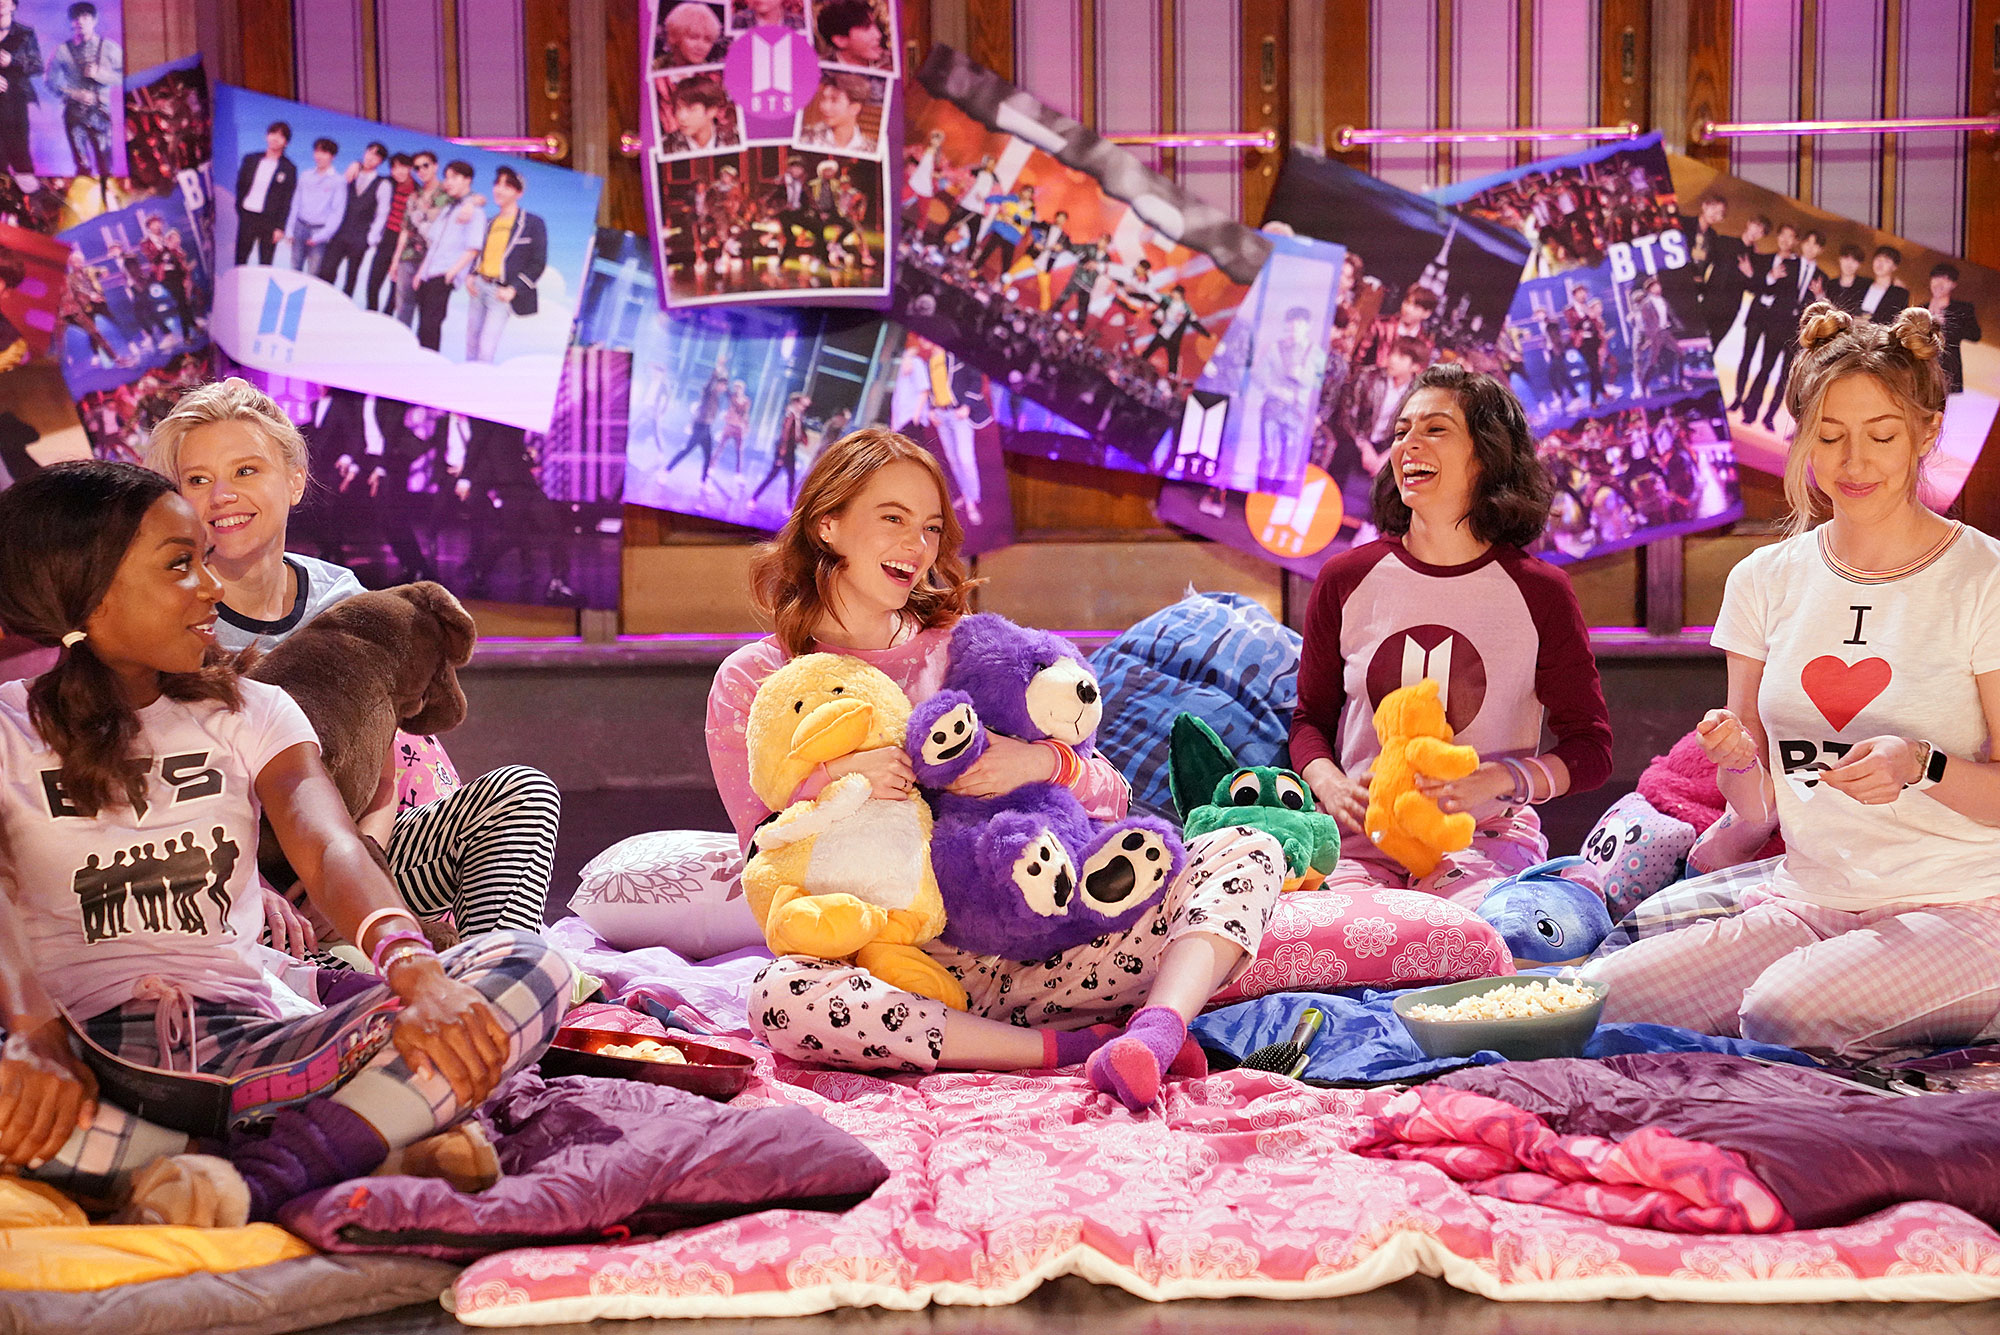 Emma Stone SNL Recap - Ego Nwodim, Kate McKinnon, host Emma Stone, Melissa Villaseñor, and Heidi Gardner during Promos in Studio 8H on Tuesday, April 9, 2019.